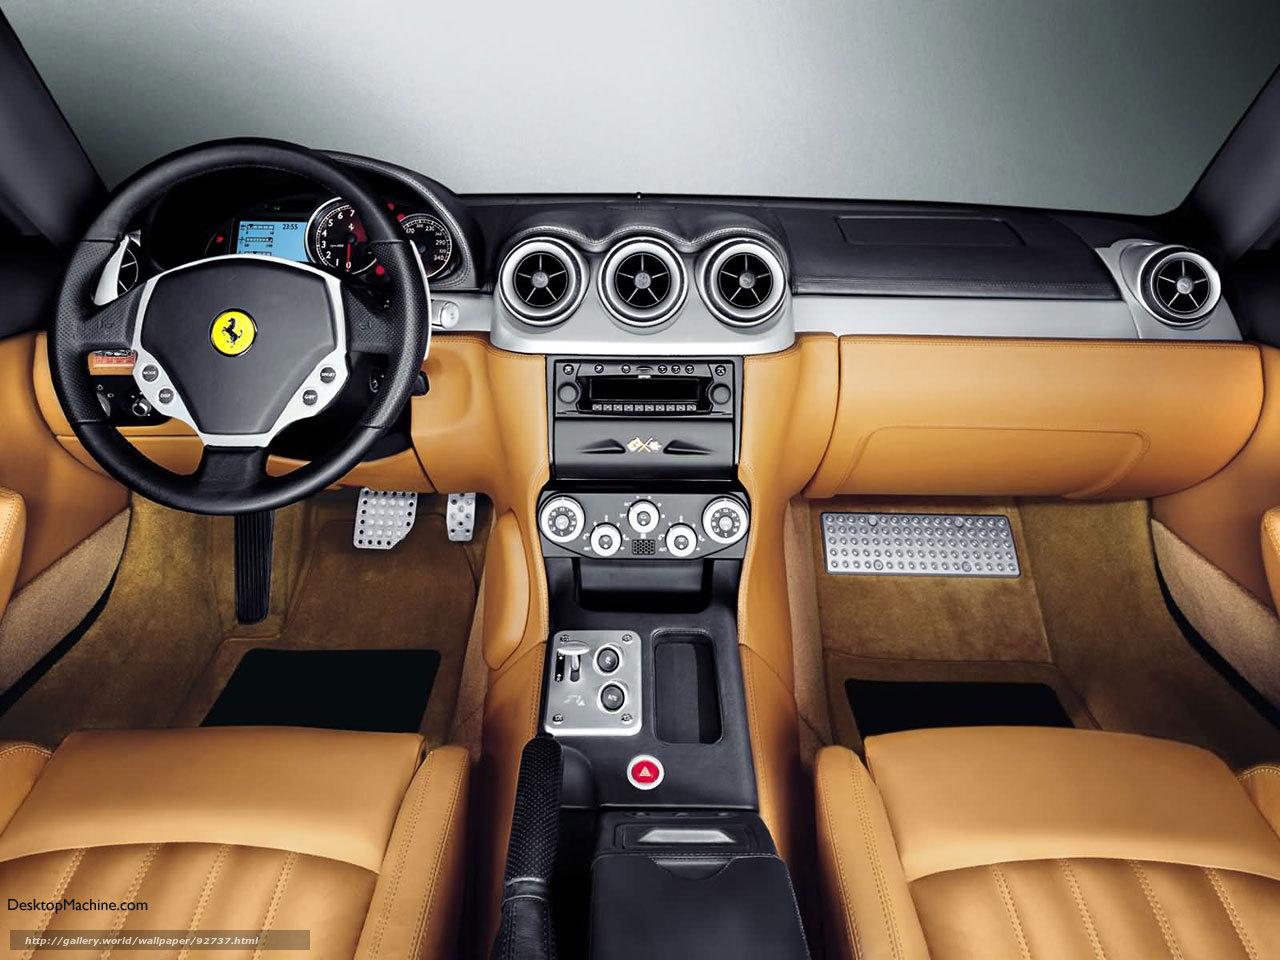 Download wallpaper Ferrari,  90210,  auto,  Machines free desktop wallpaper in the resolution 1280x960 — picture №92737